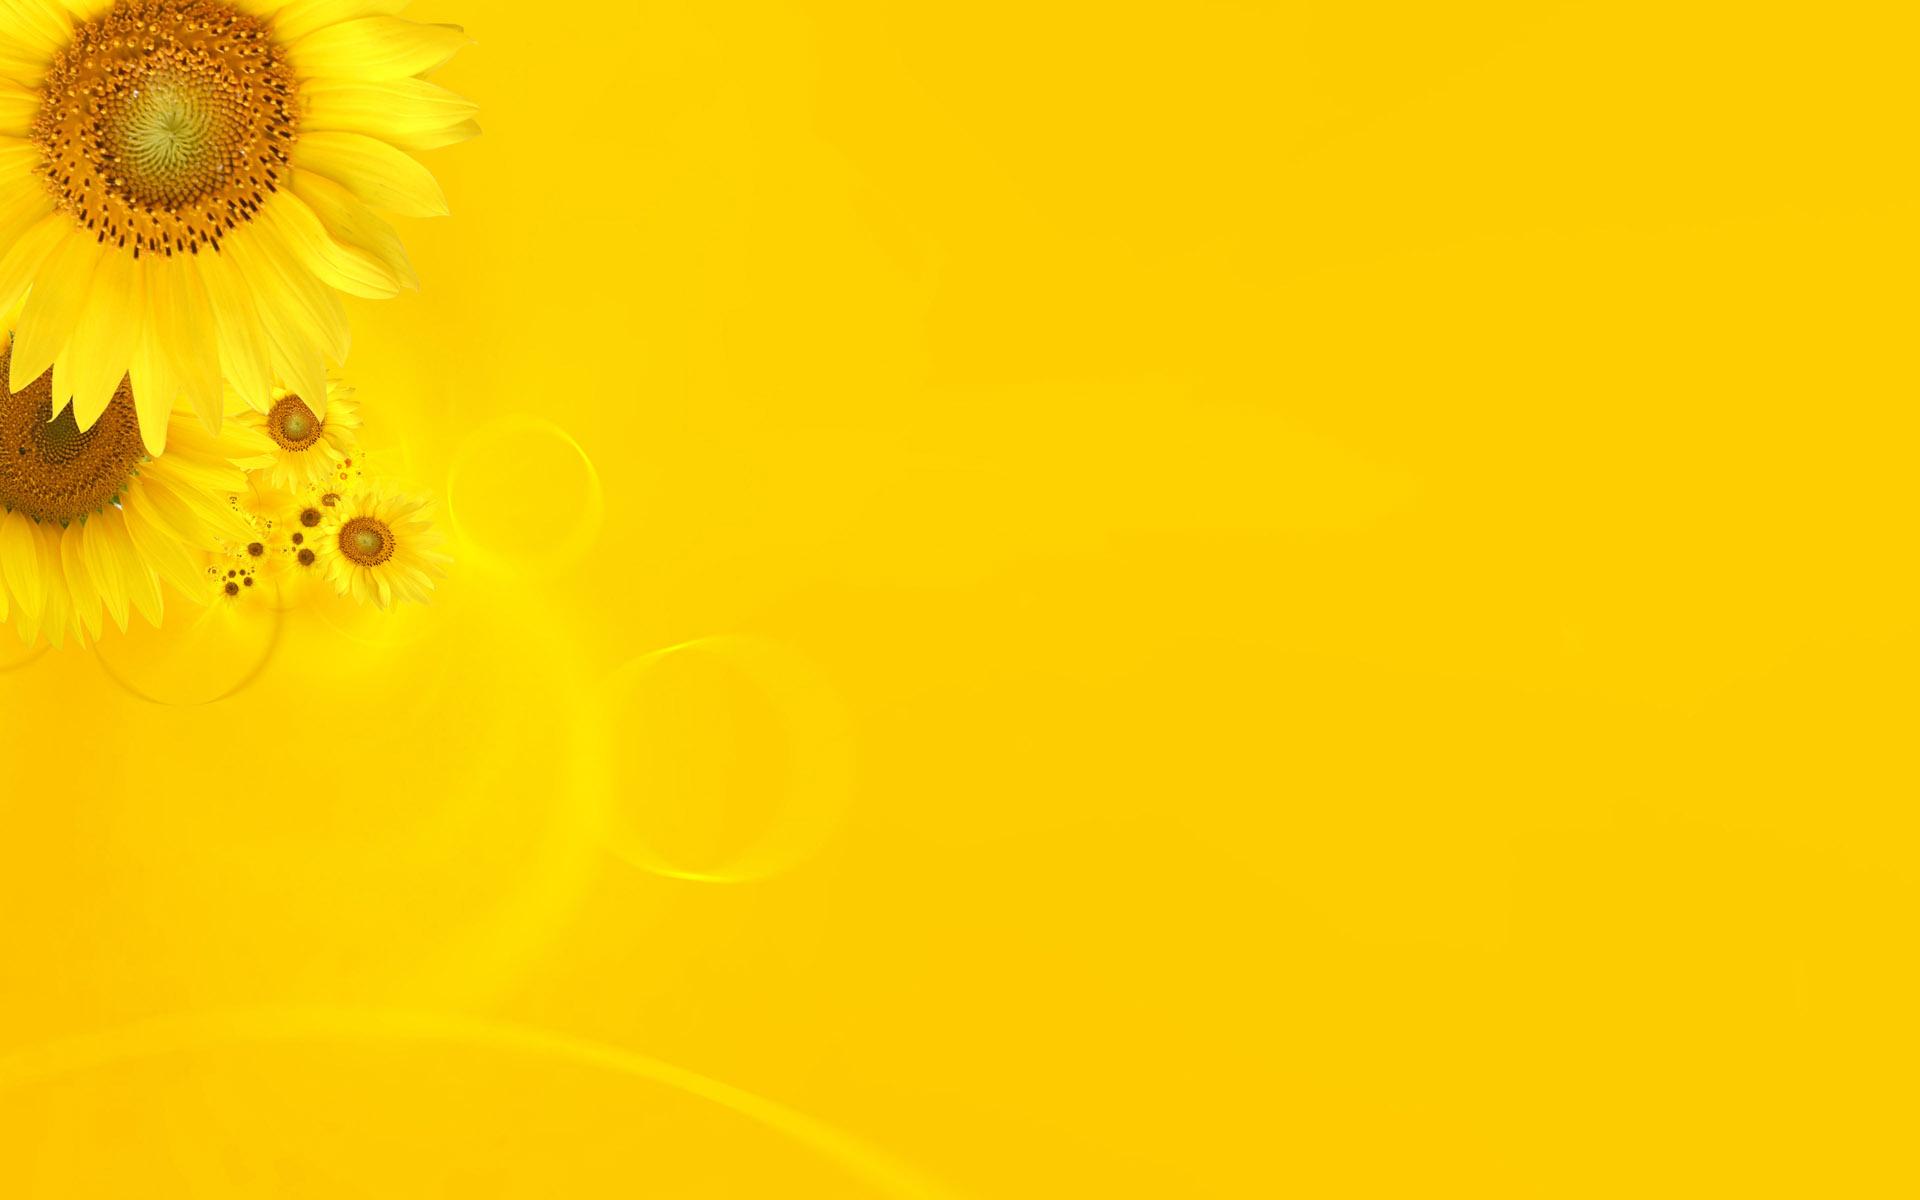 Yellow Wallpaper 1 1920x1200